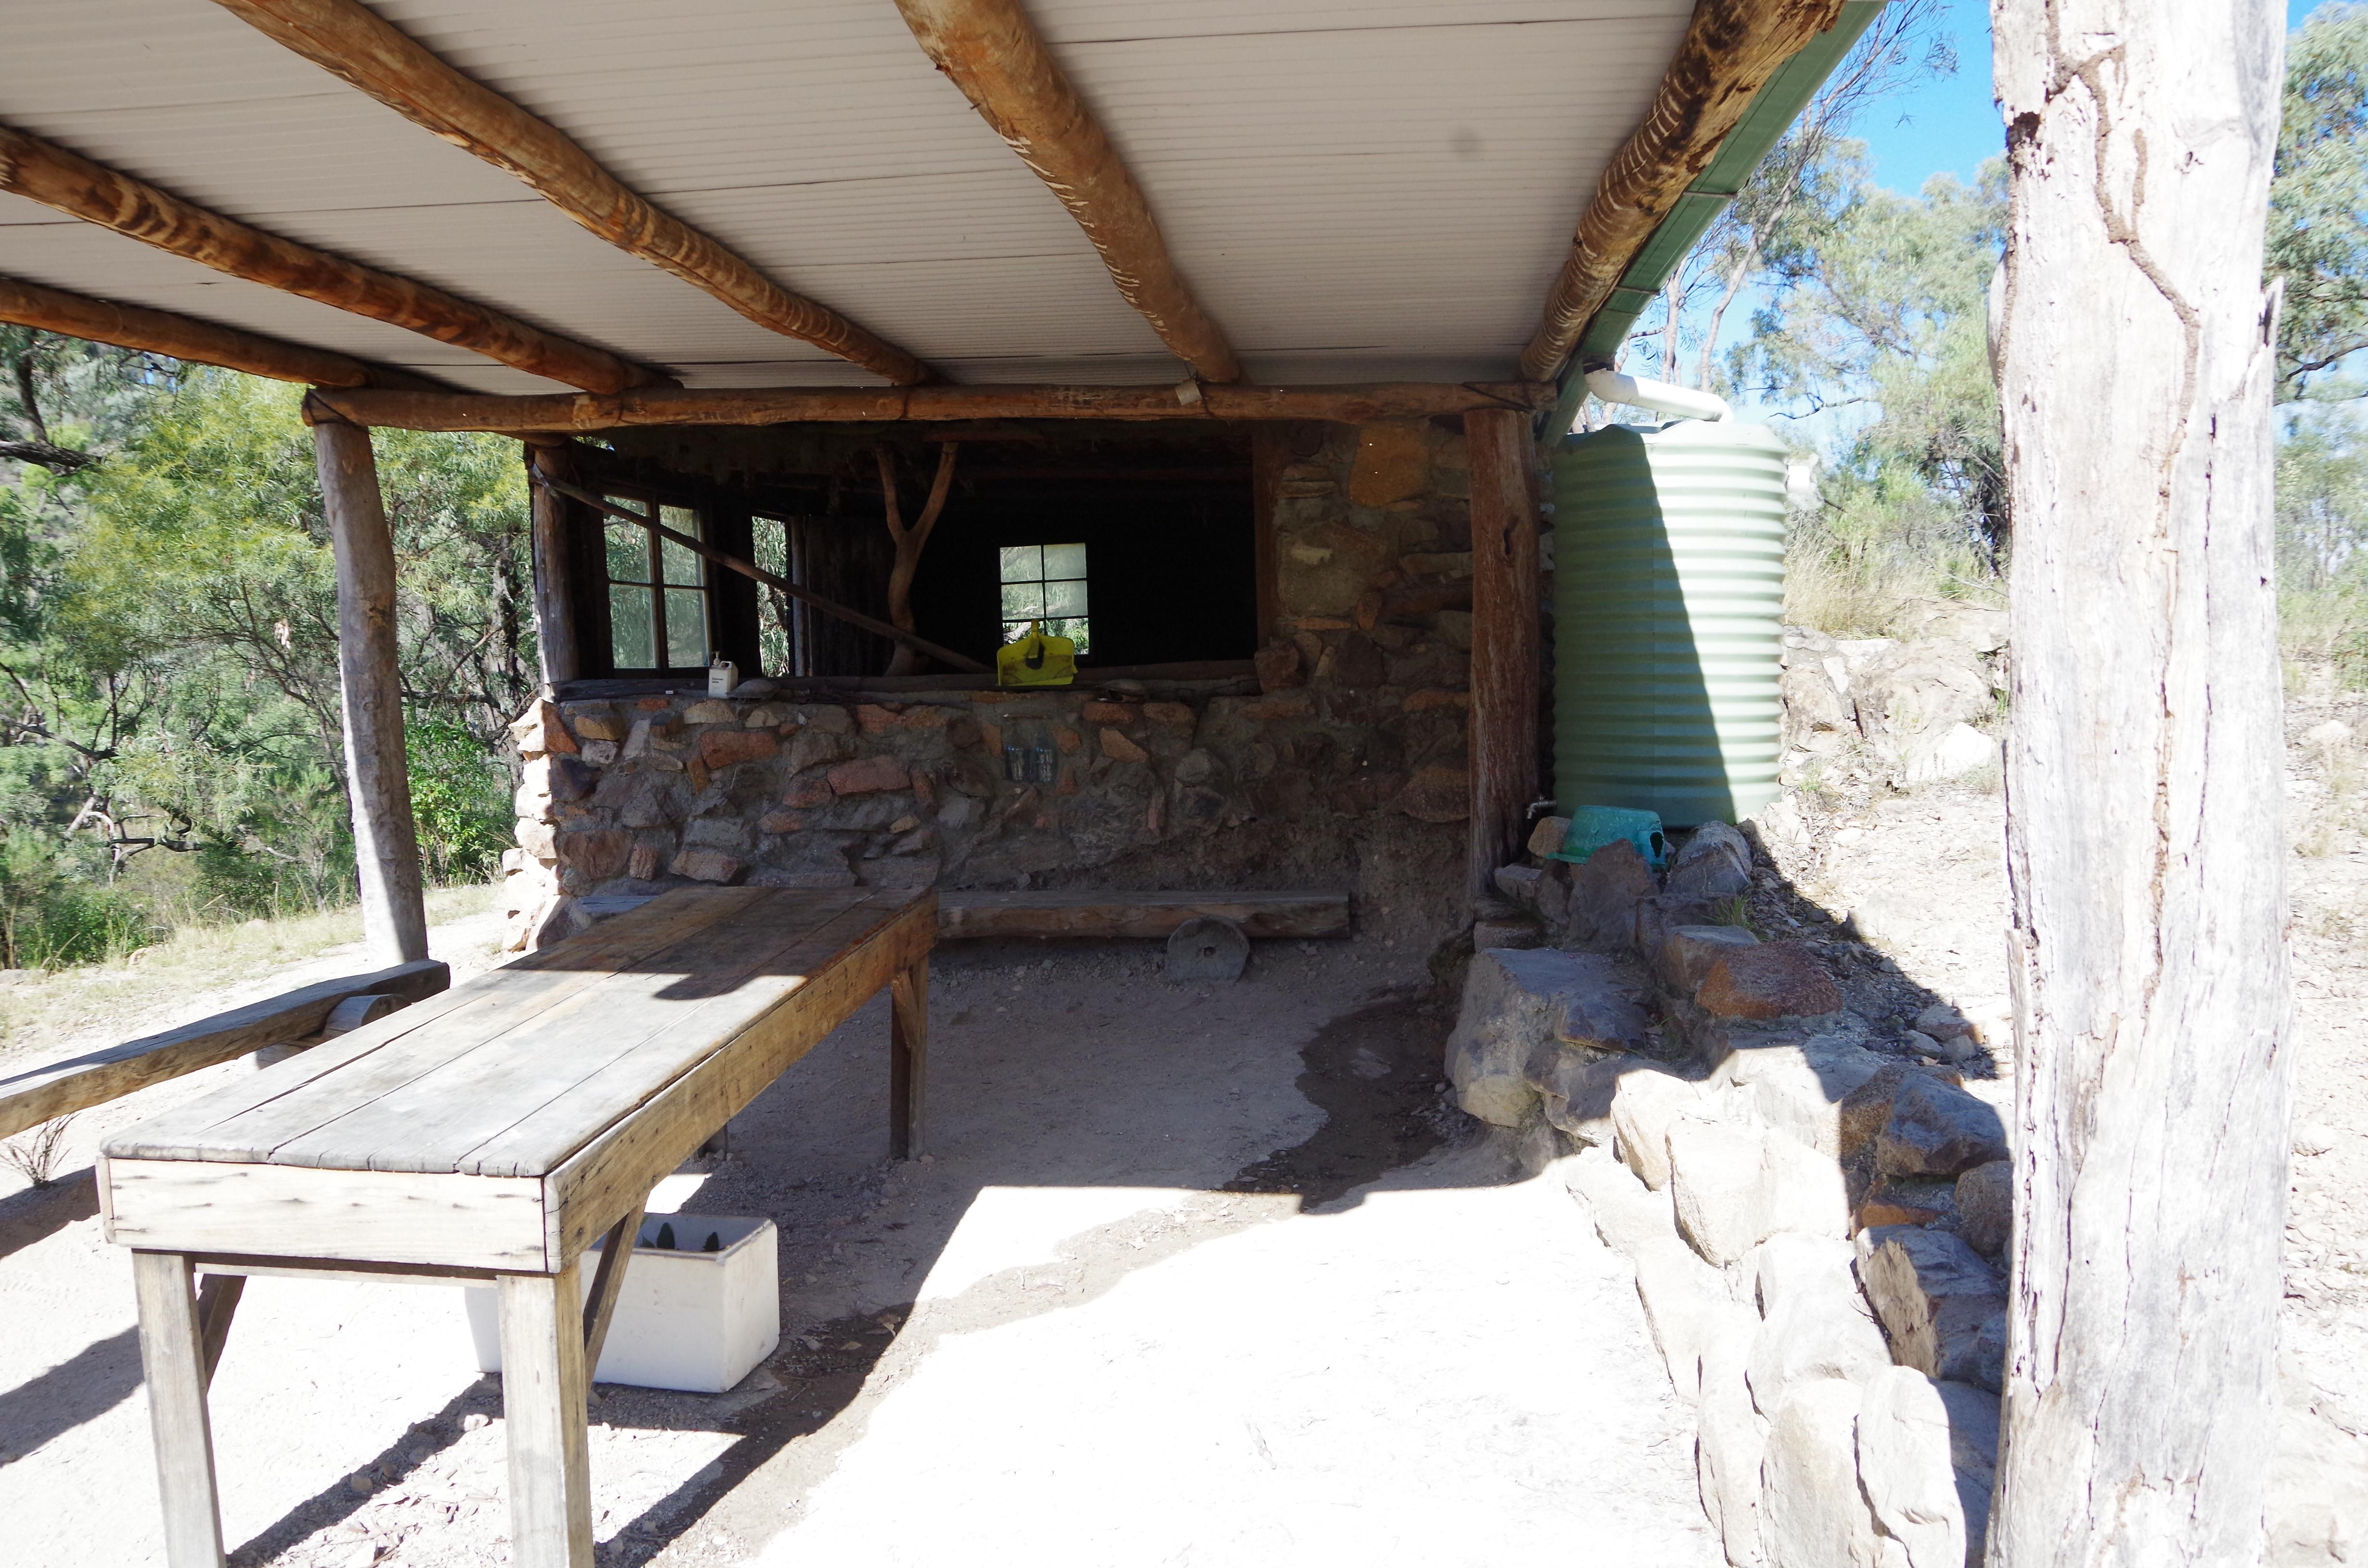 Stone Hut Activity